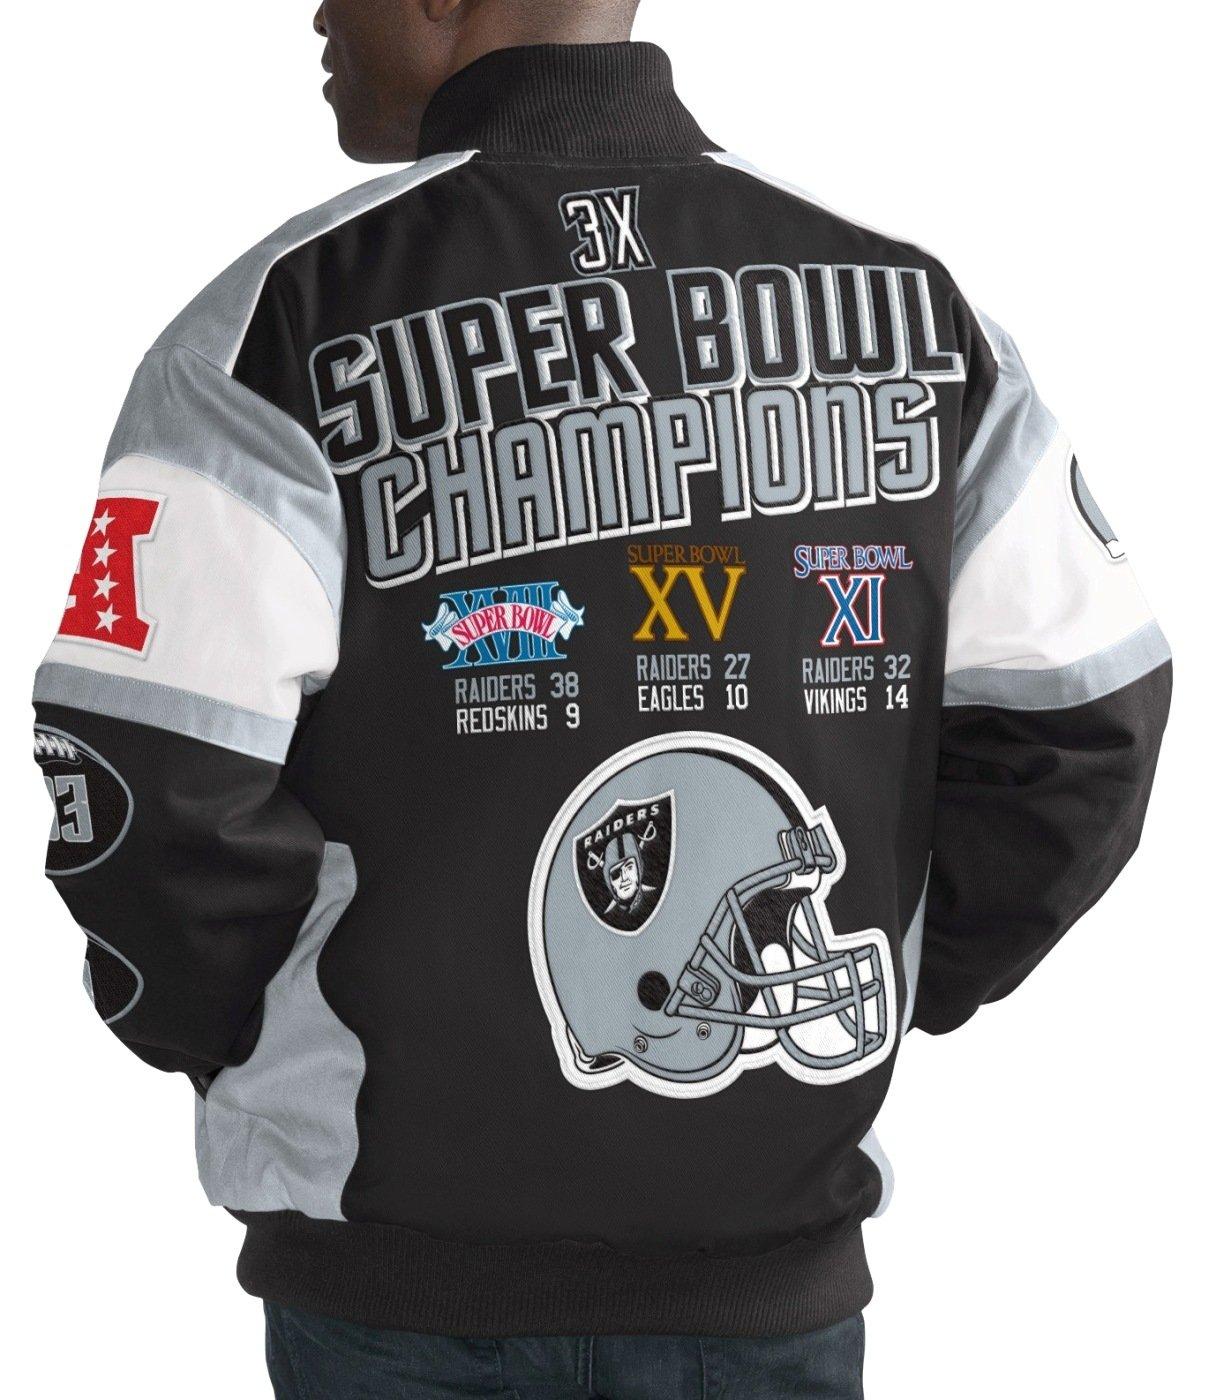 Oakland Raiders NFL G-III Super Bowl Cotton Twill Commemorative Jacket